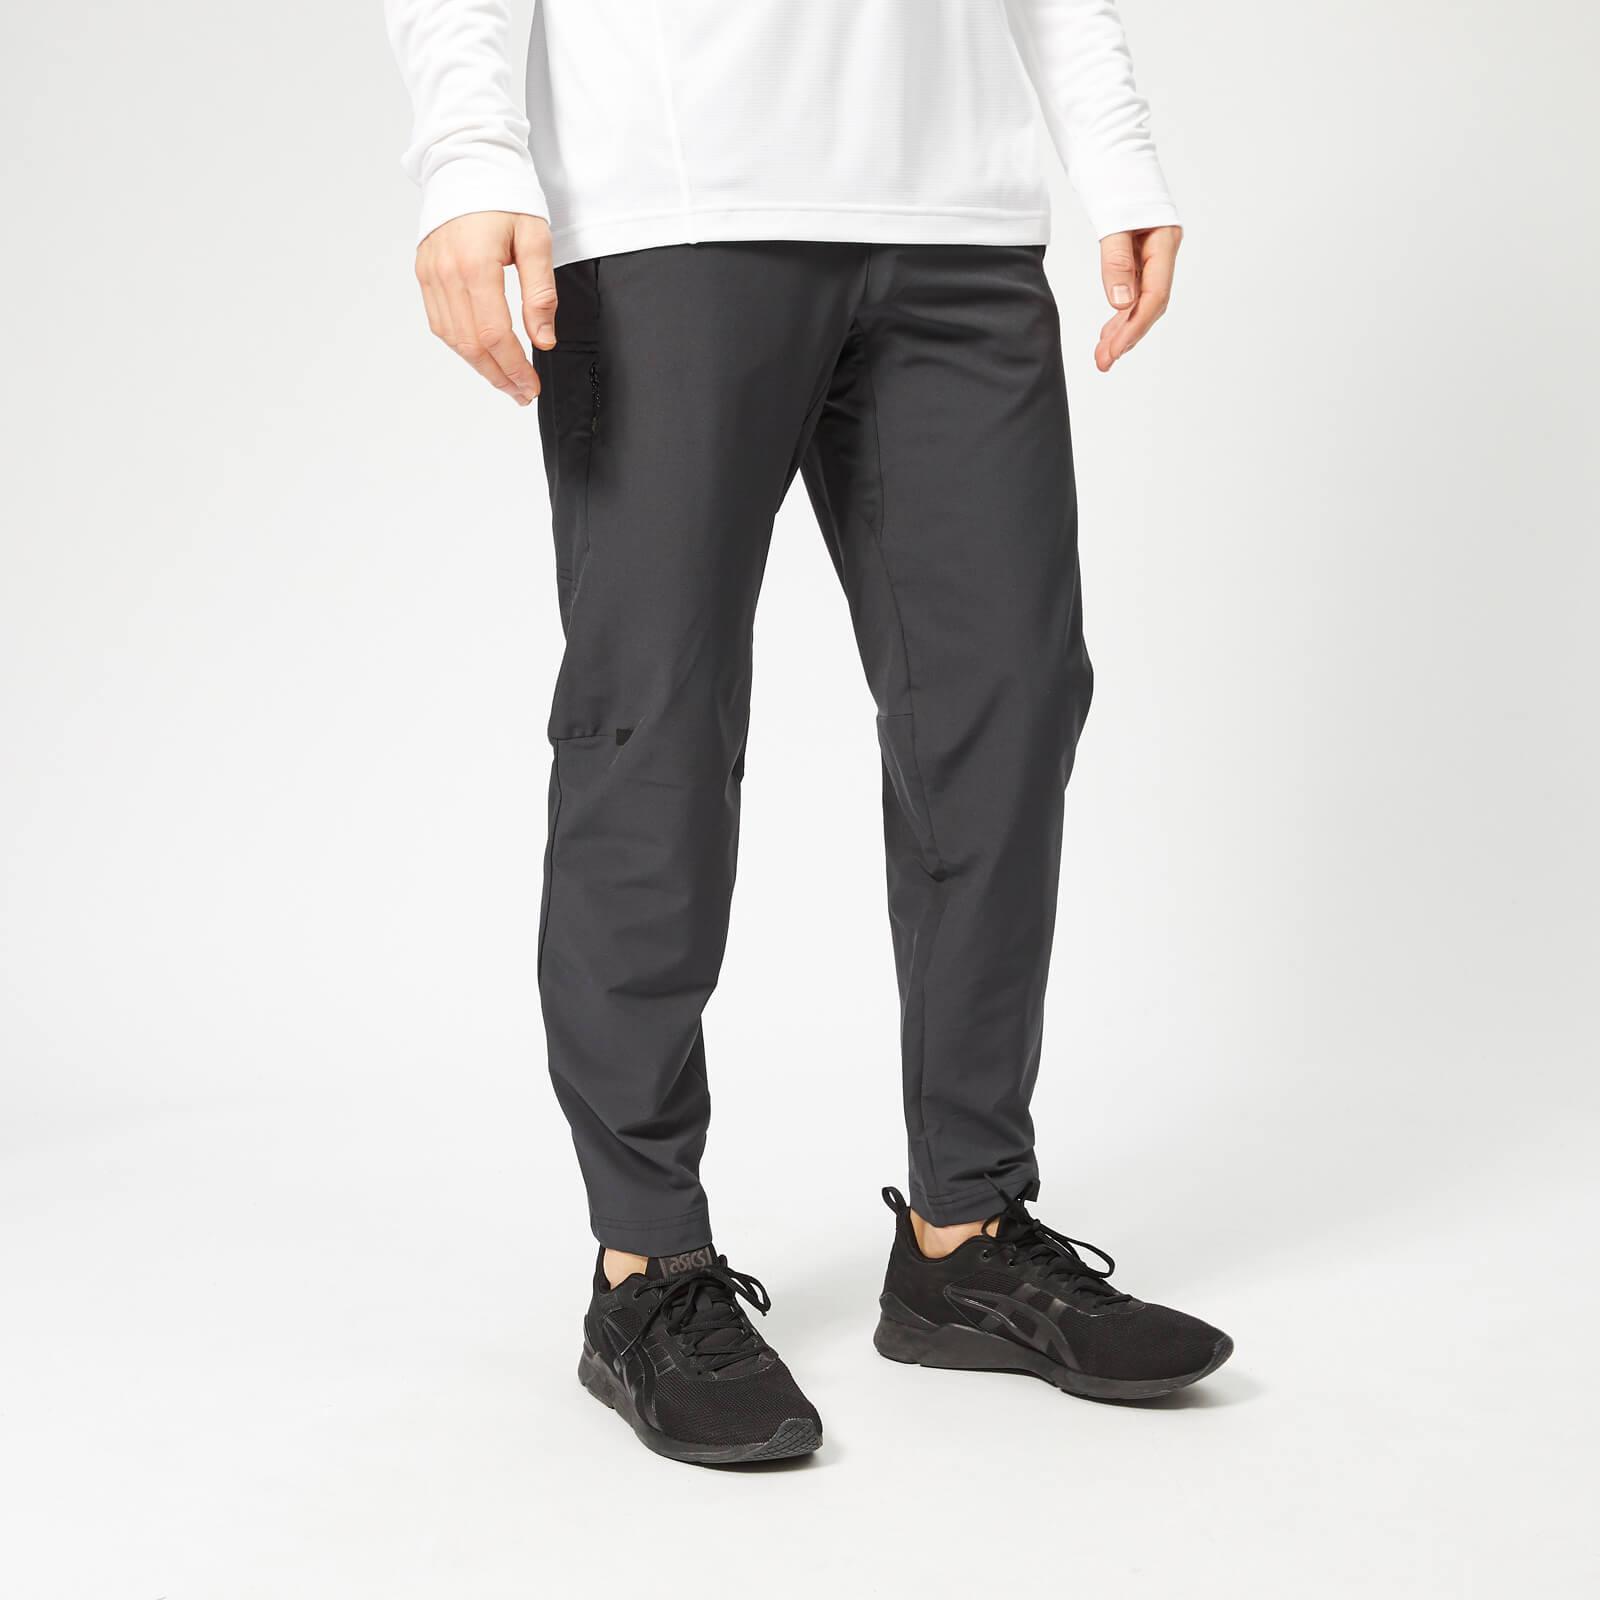 adidas Men's Terrex CTC Pants Black